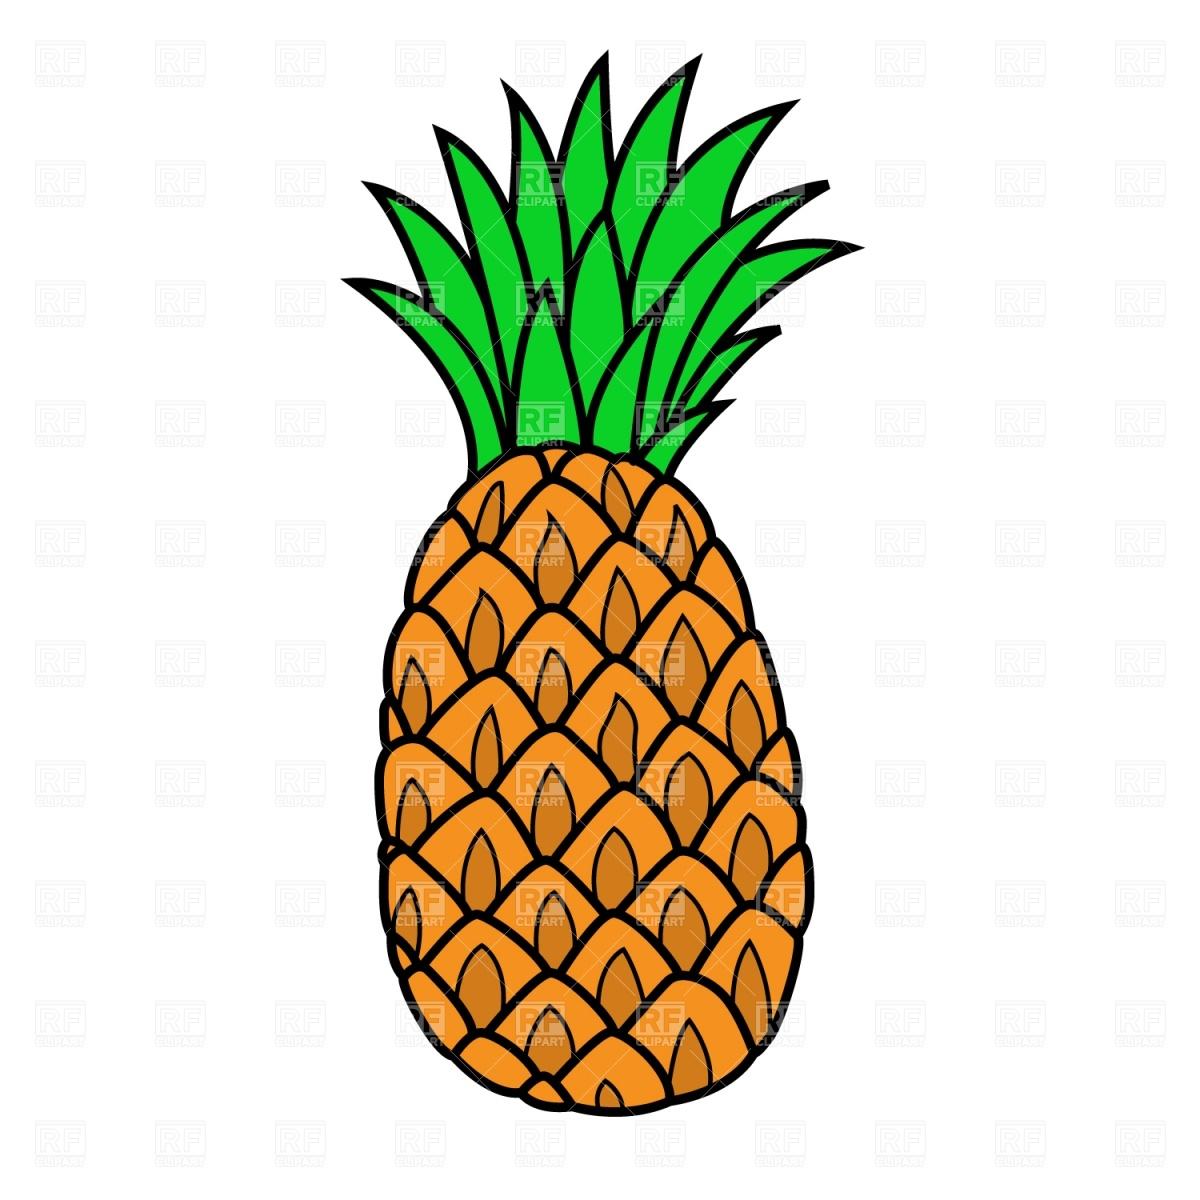 1200x1200 Pineapple Clipart Tumblr